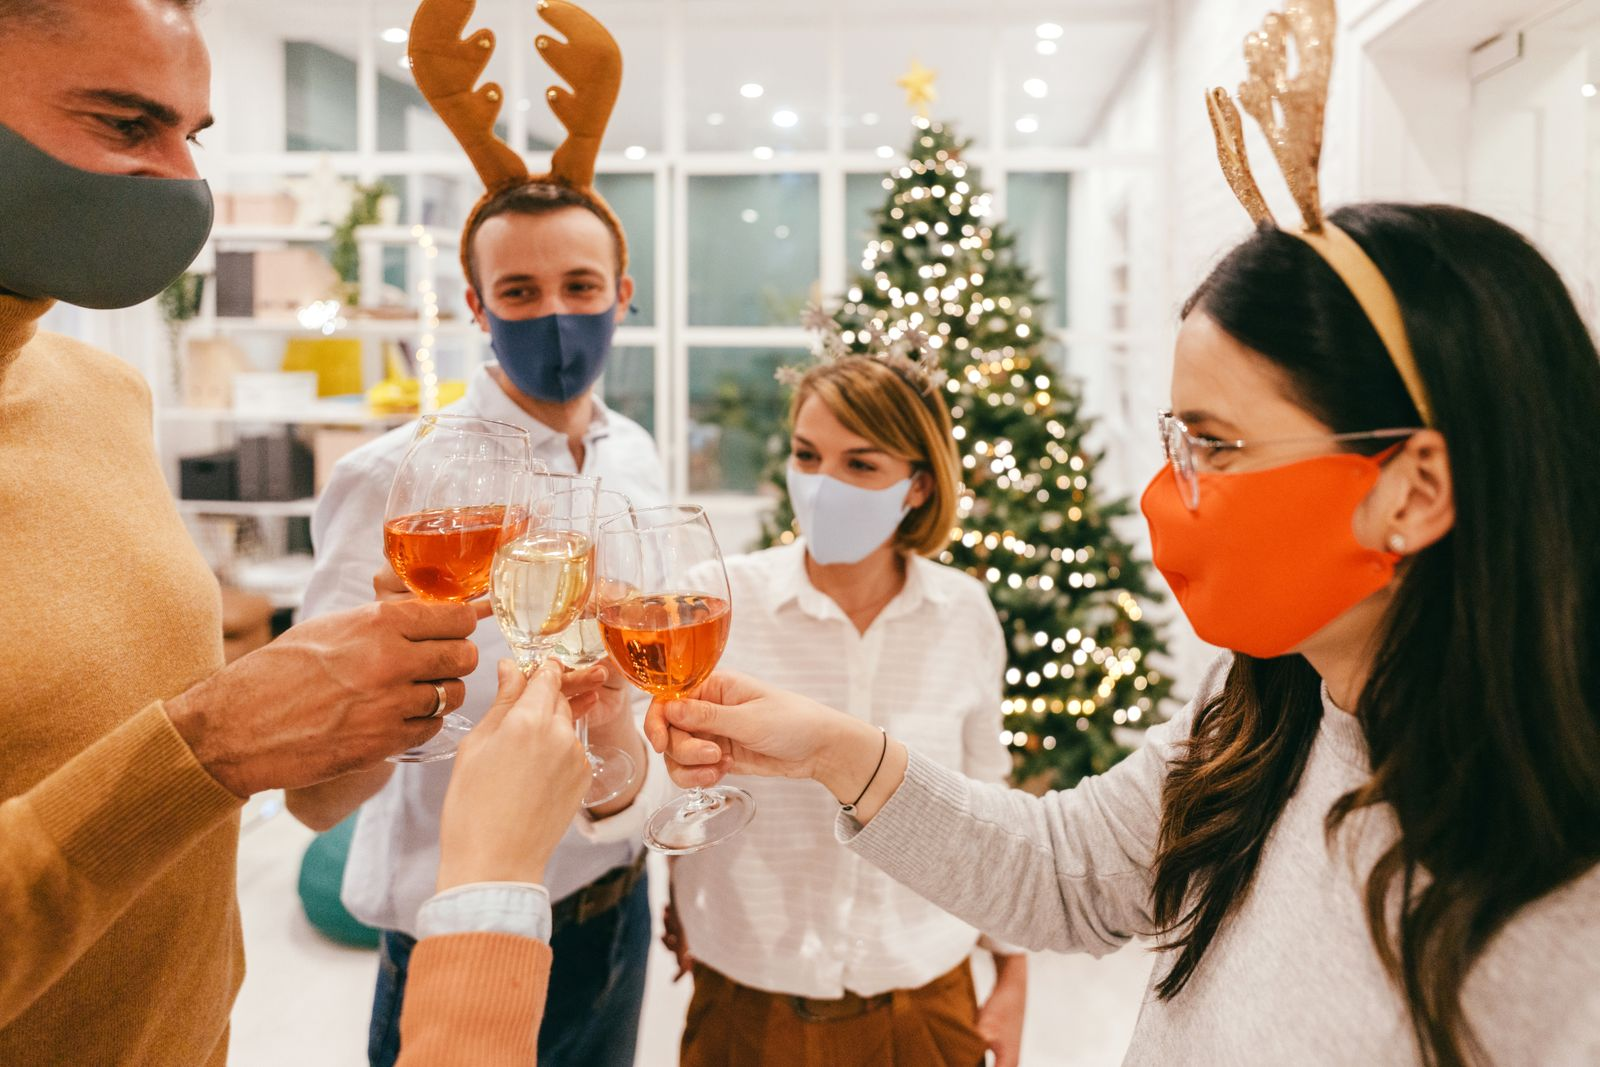 Christmas celebration in the office during Coronavirus pandemic